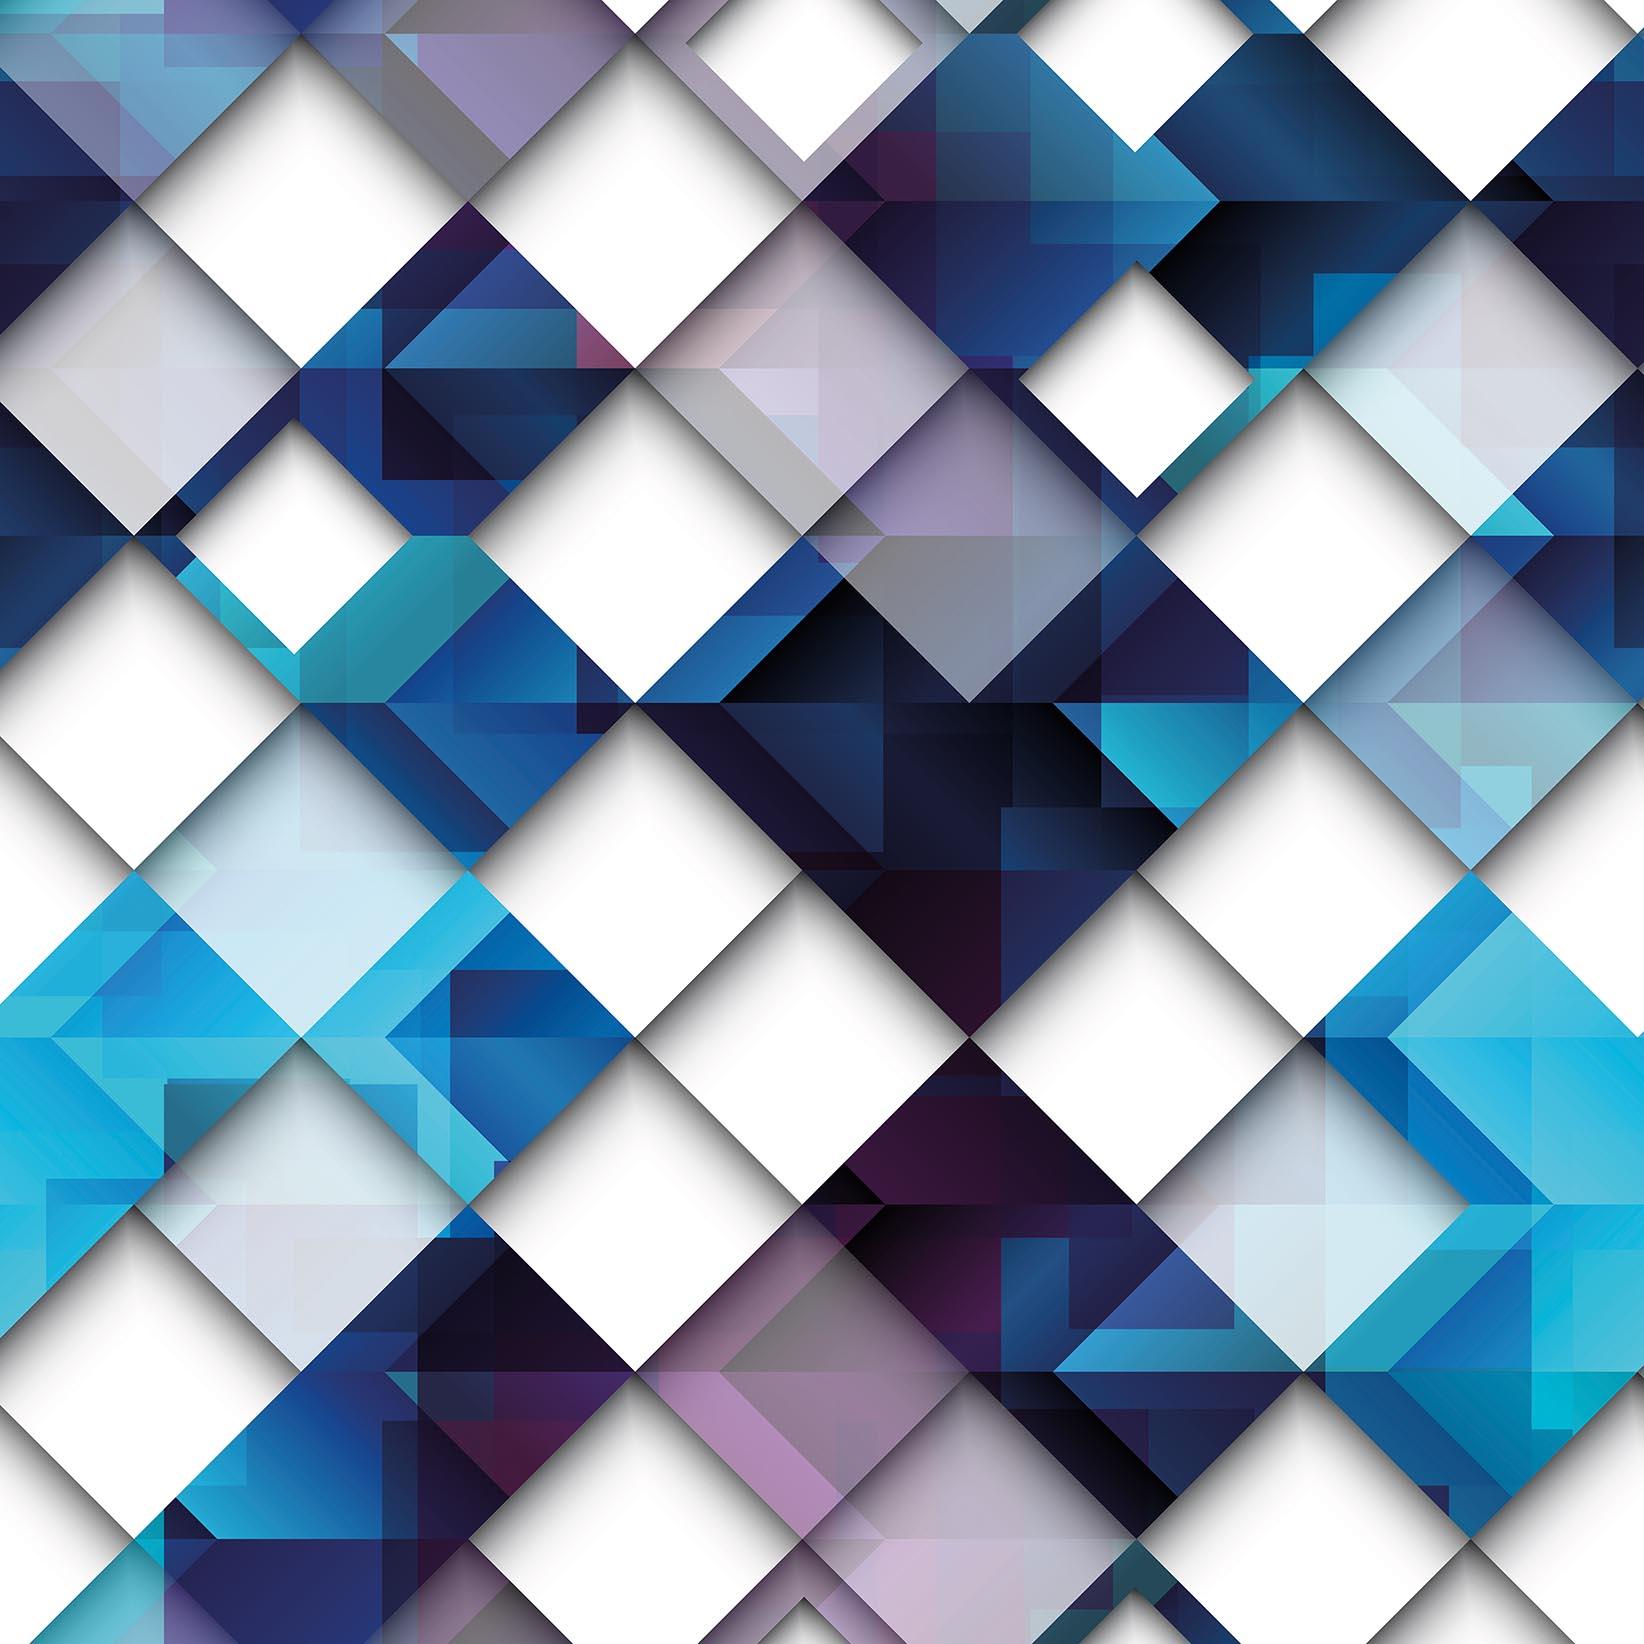 Papel De Parede Geométrico Losangos Diamantes Tons de Azul e Branco